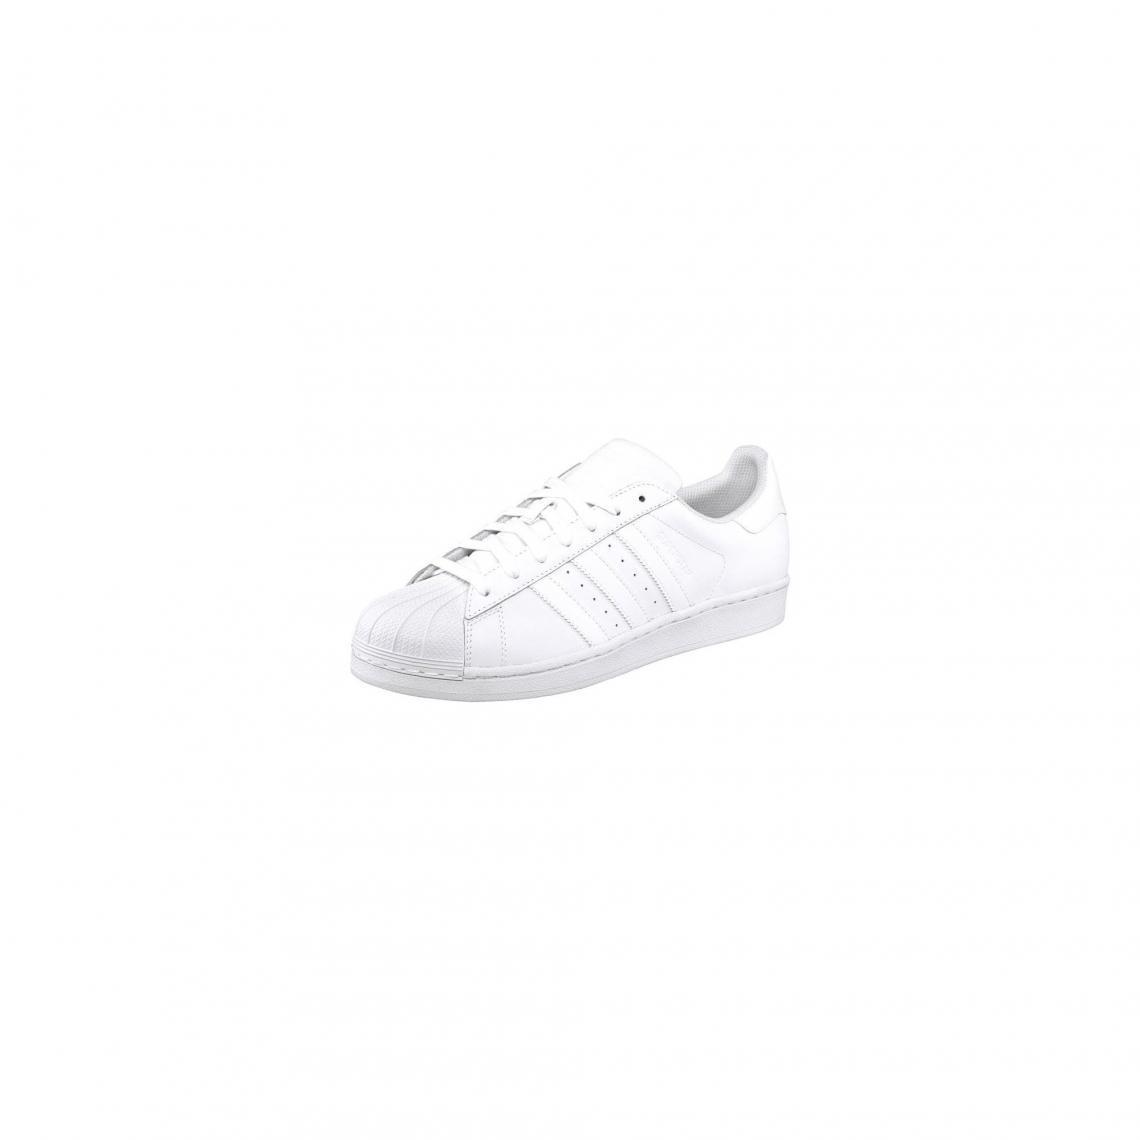 ff7bf5d877f64 Tennis adidas Originals Superstar East River pour homme - Blanc Adidas  Originals Homme